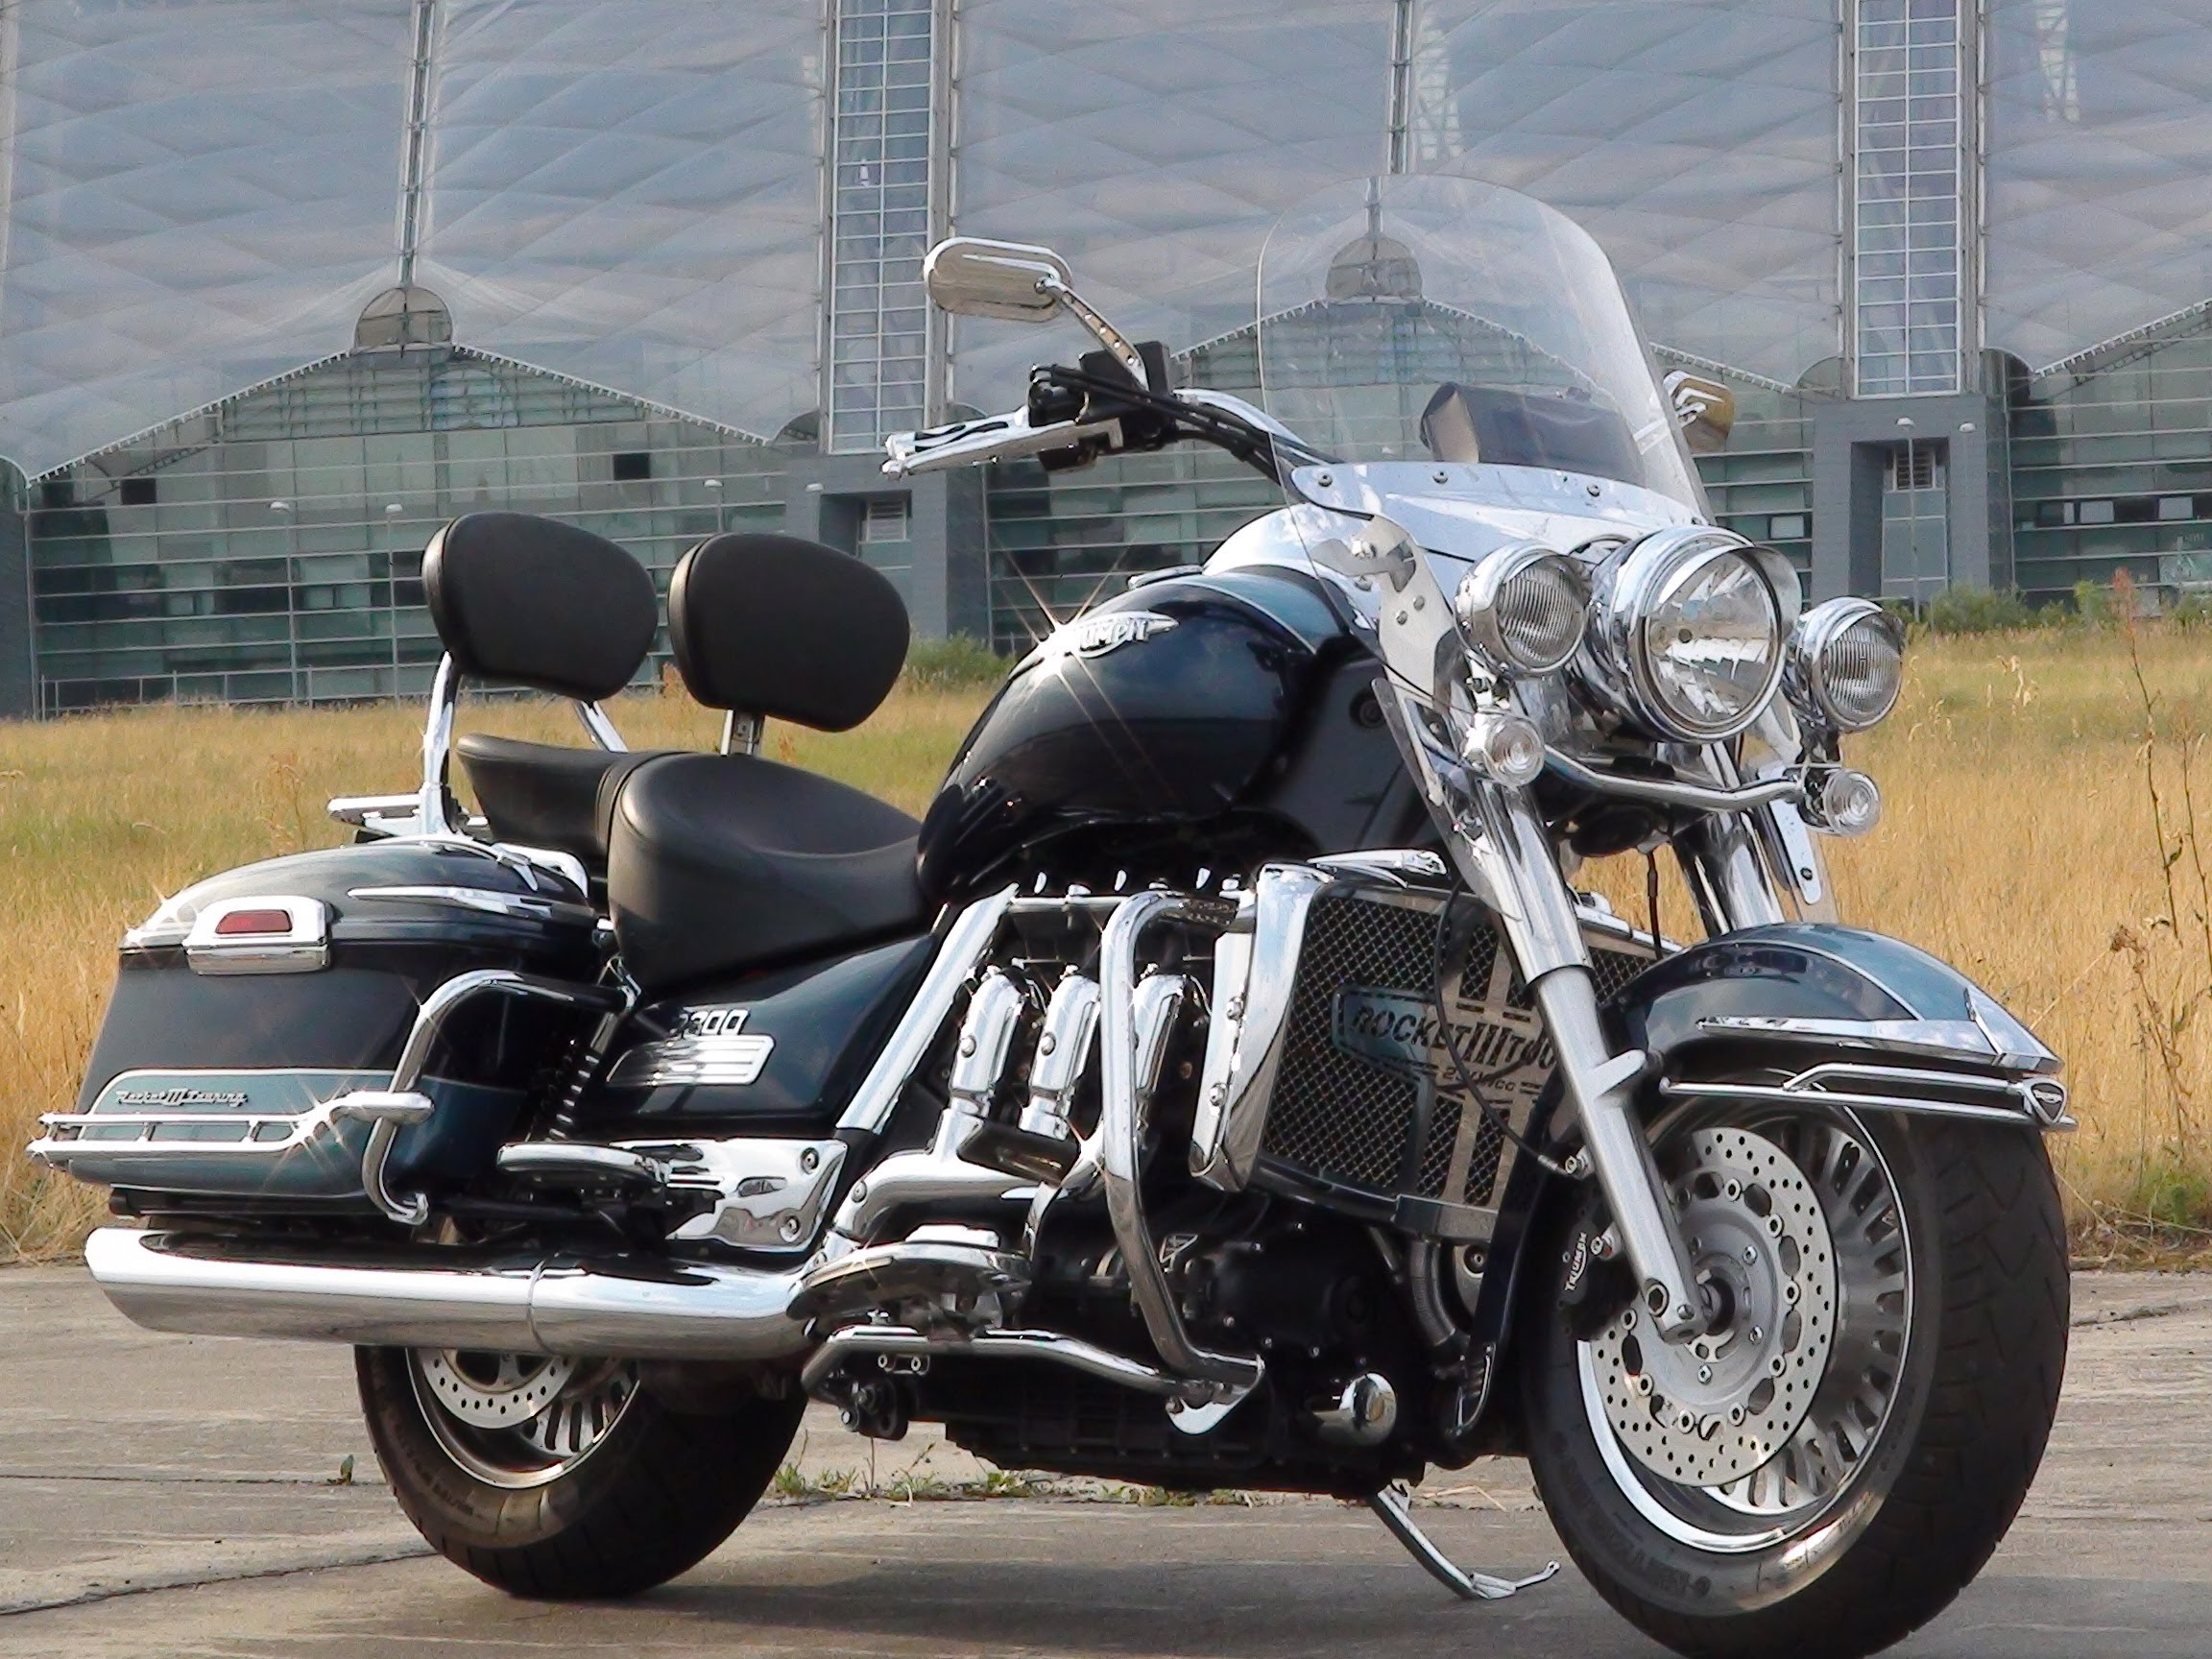 Triumph Motorcycle Parts from Predator Motorsport